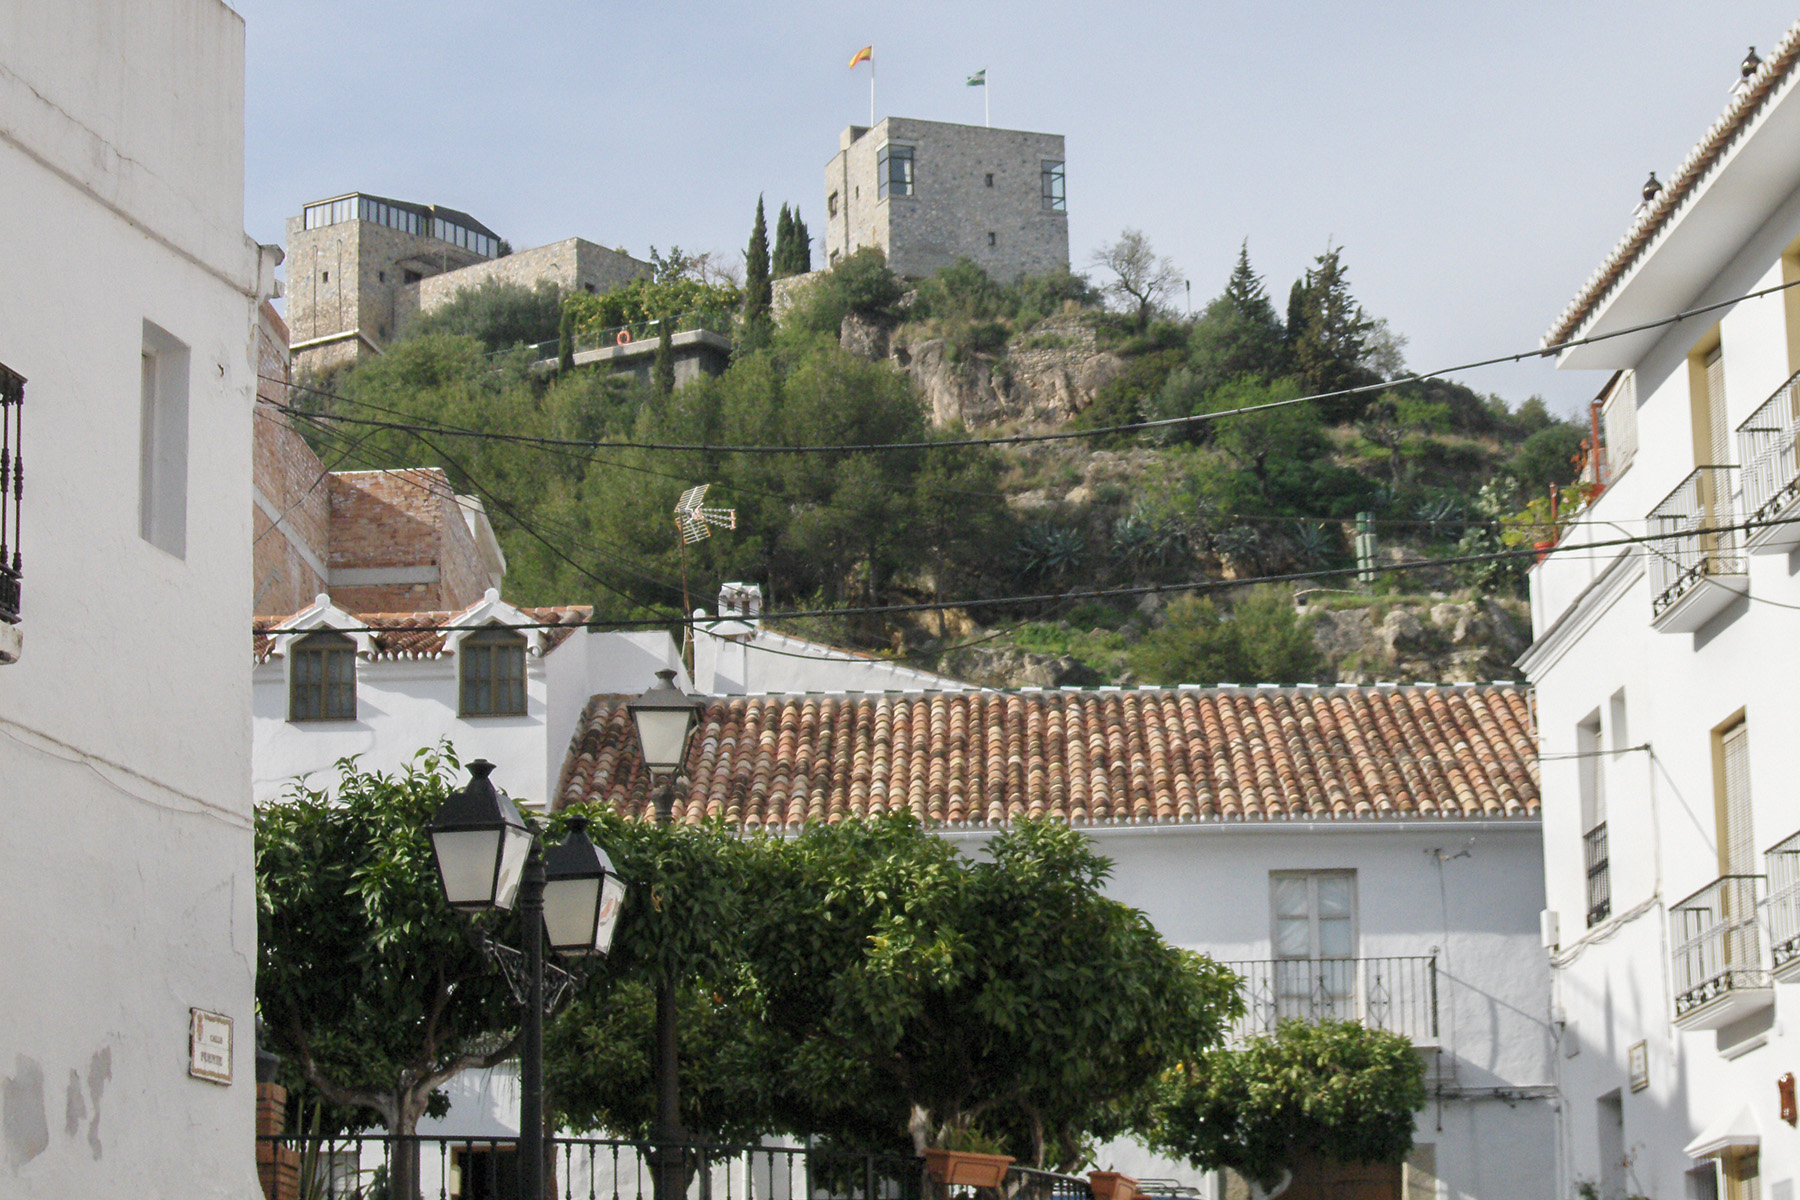 Castillo de Monda, Spain